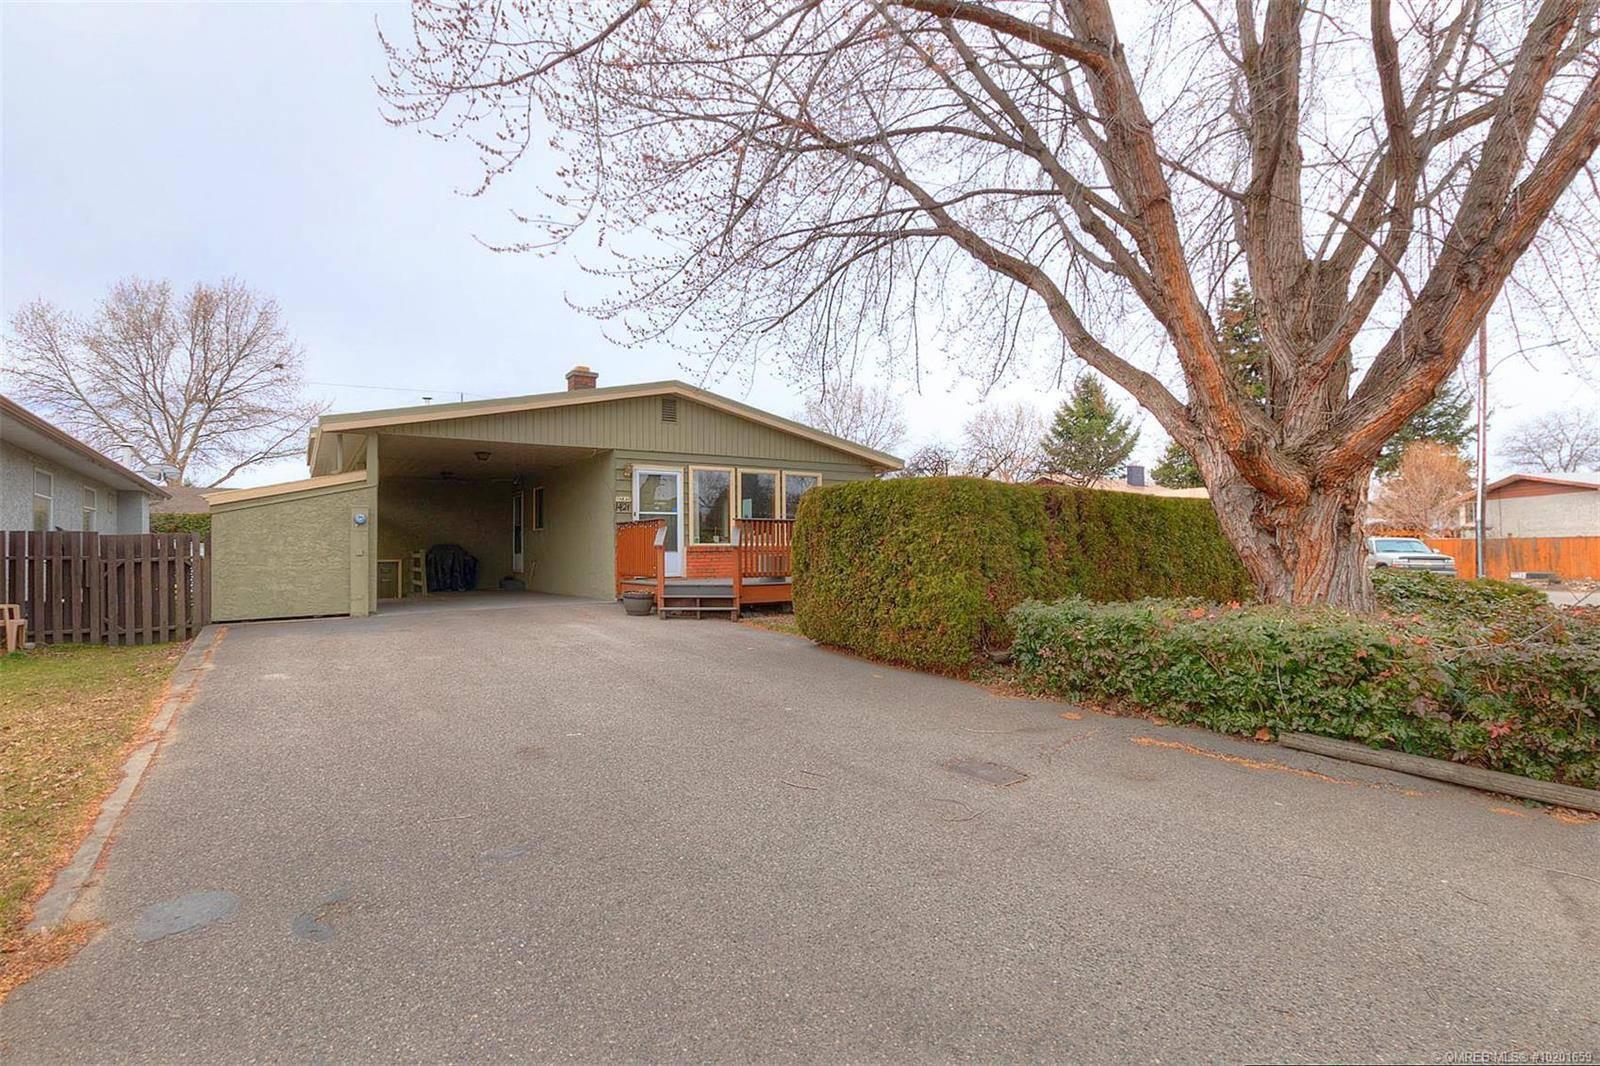 House for sale at 1421 Inkar Rd Kelowna British Columbia - MLS: 10201659